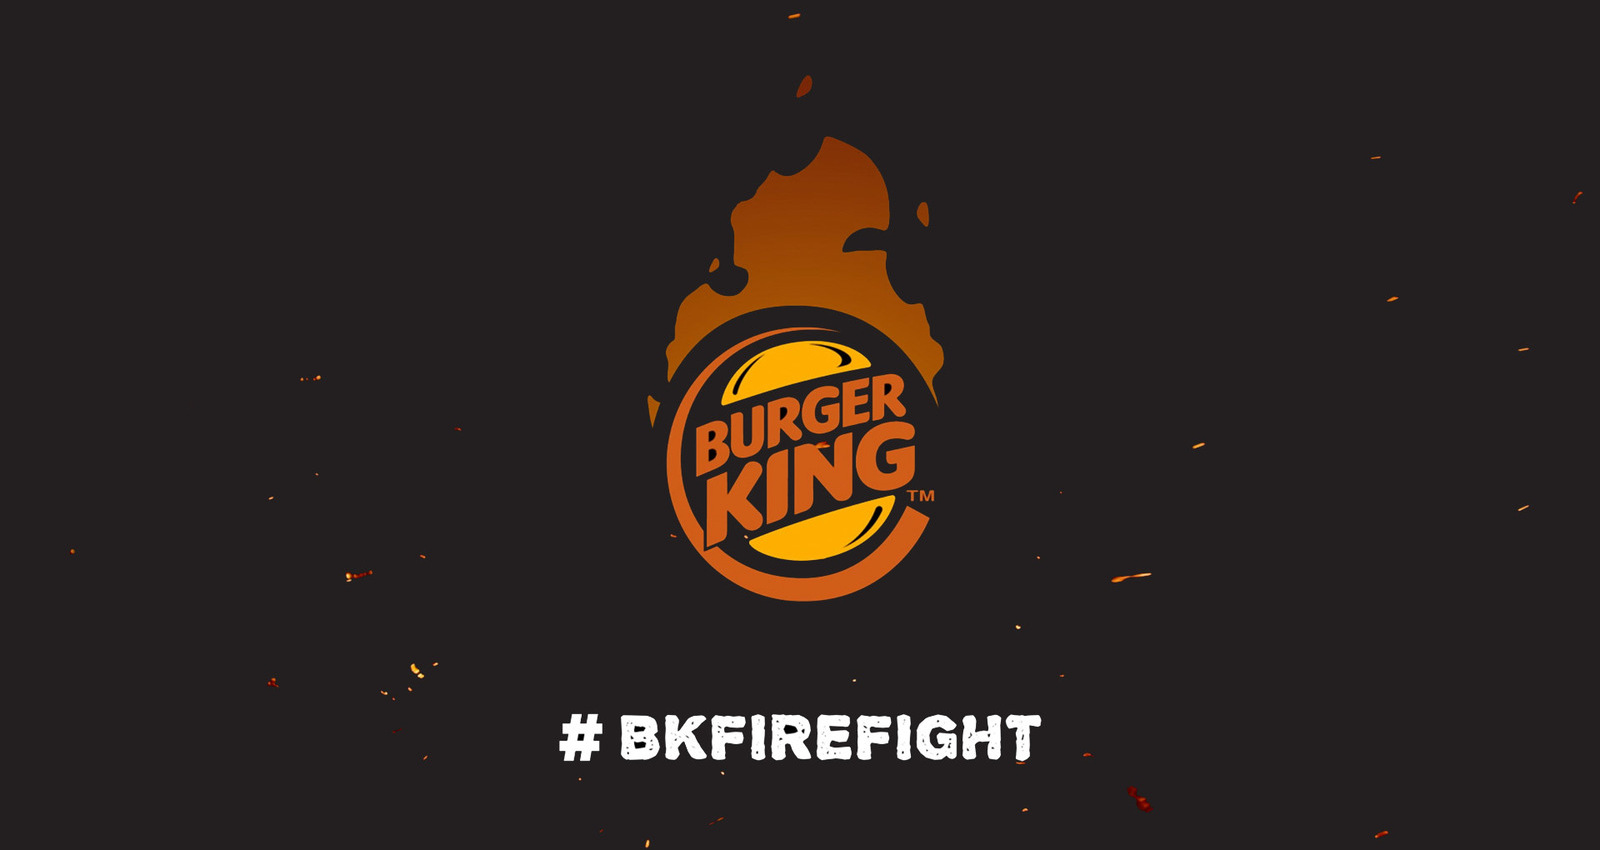 BK Firefight